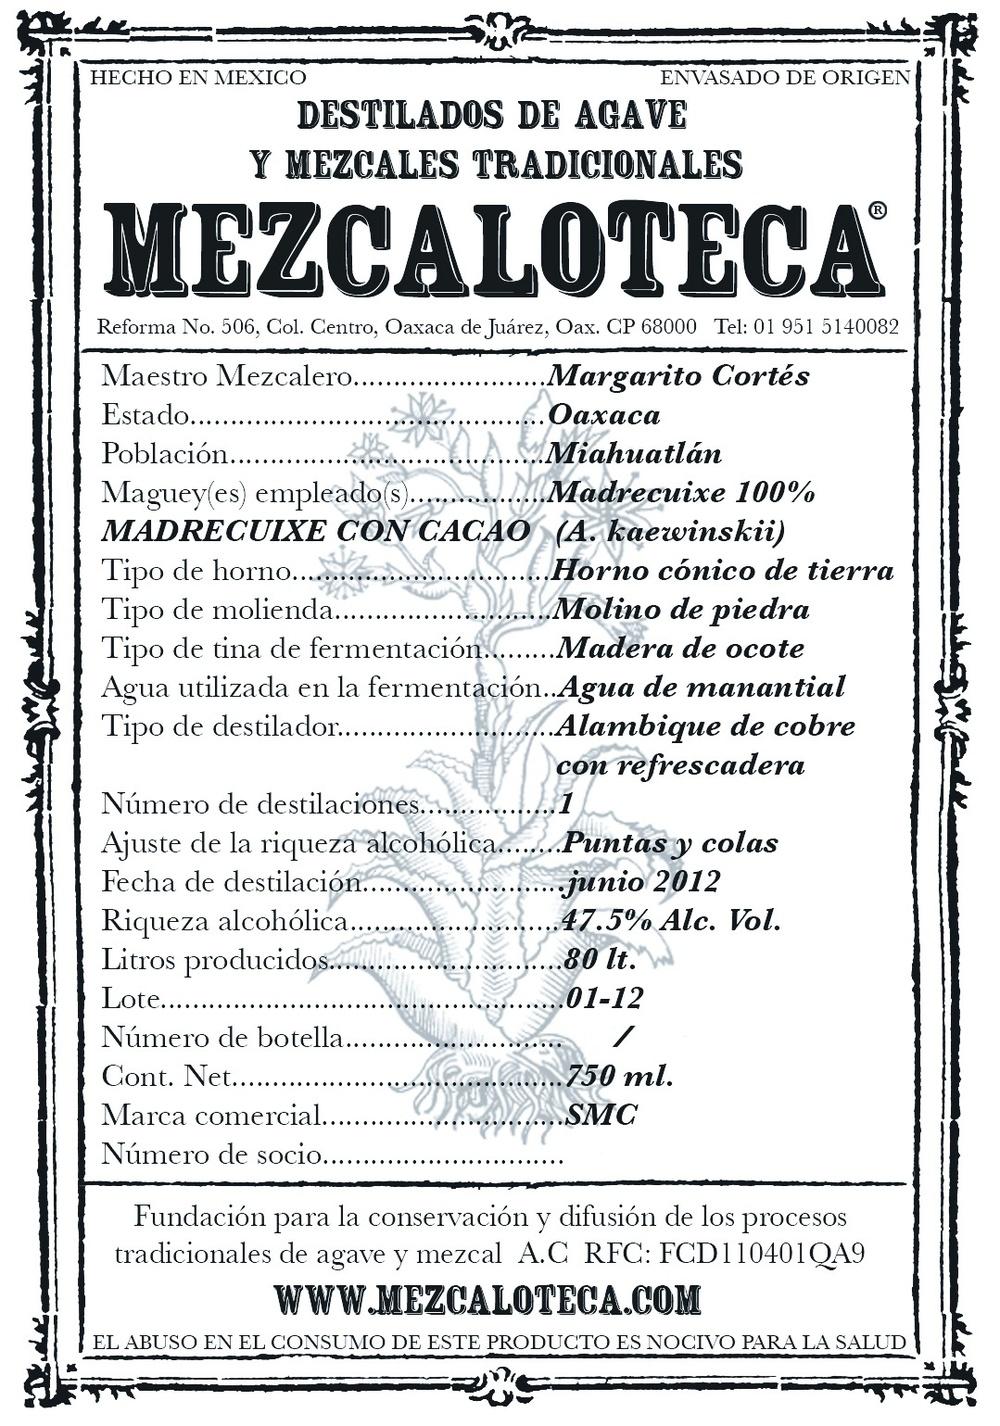 madrecuixe.cacao.750[1]_2 web.jpg